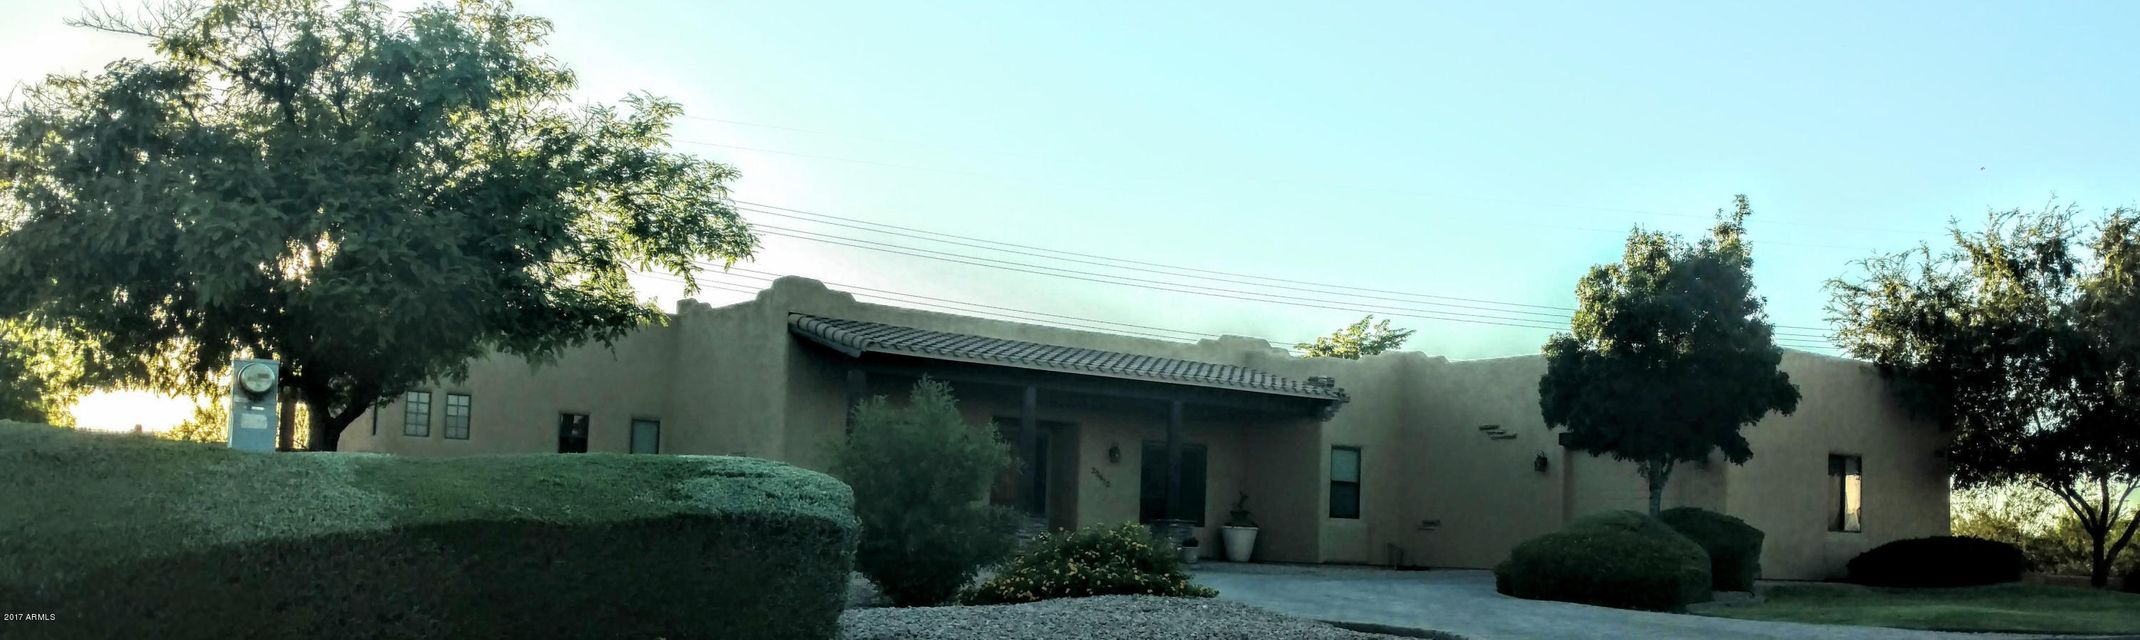 23612 N 105th Lane, Peoria, AZ 85383